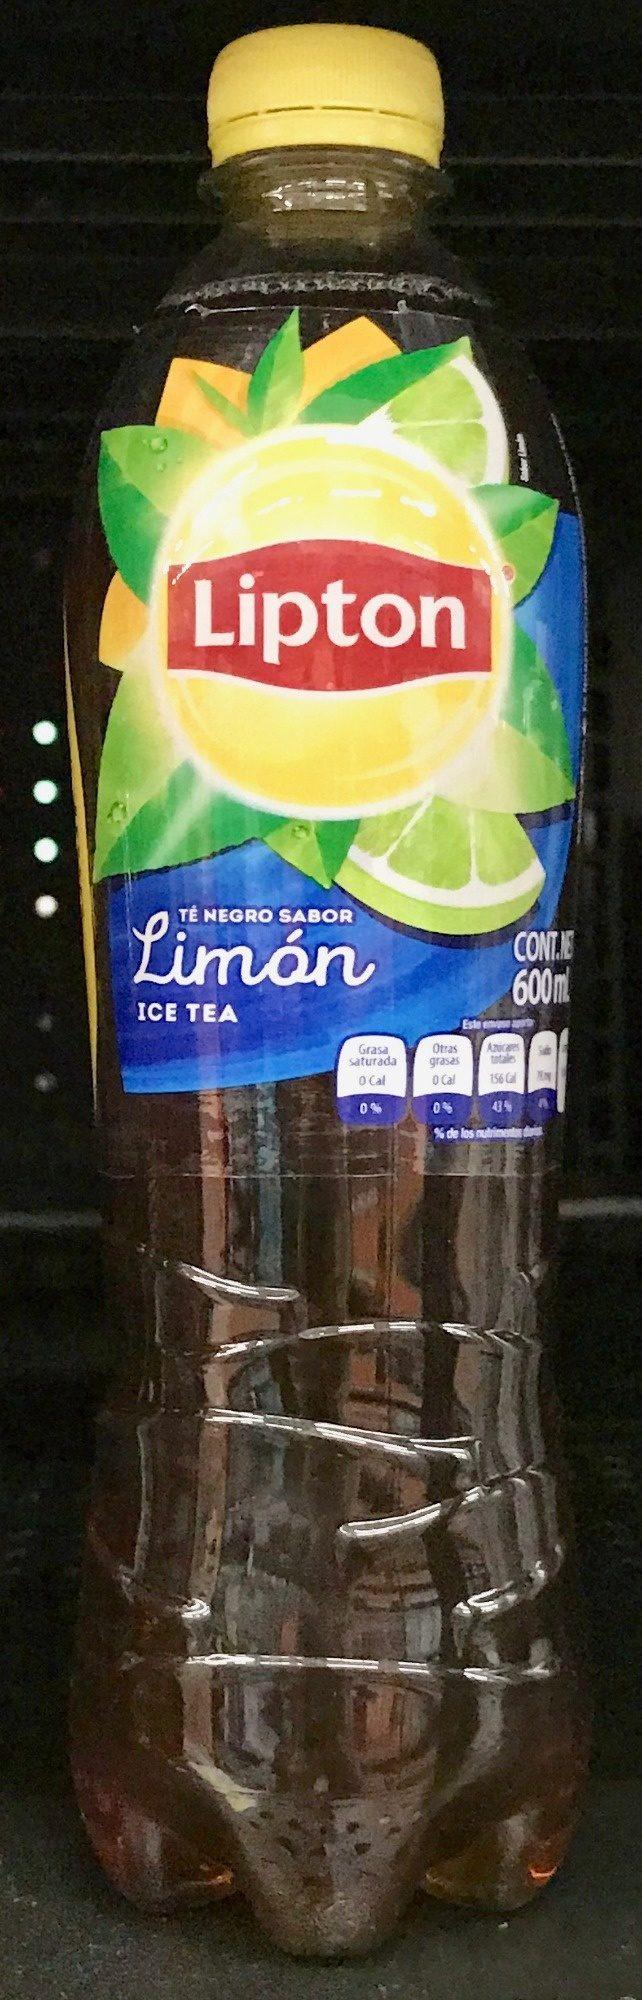 Lipton sabor limón - Product